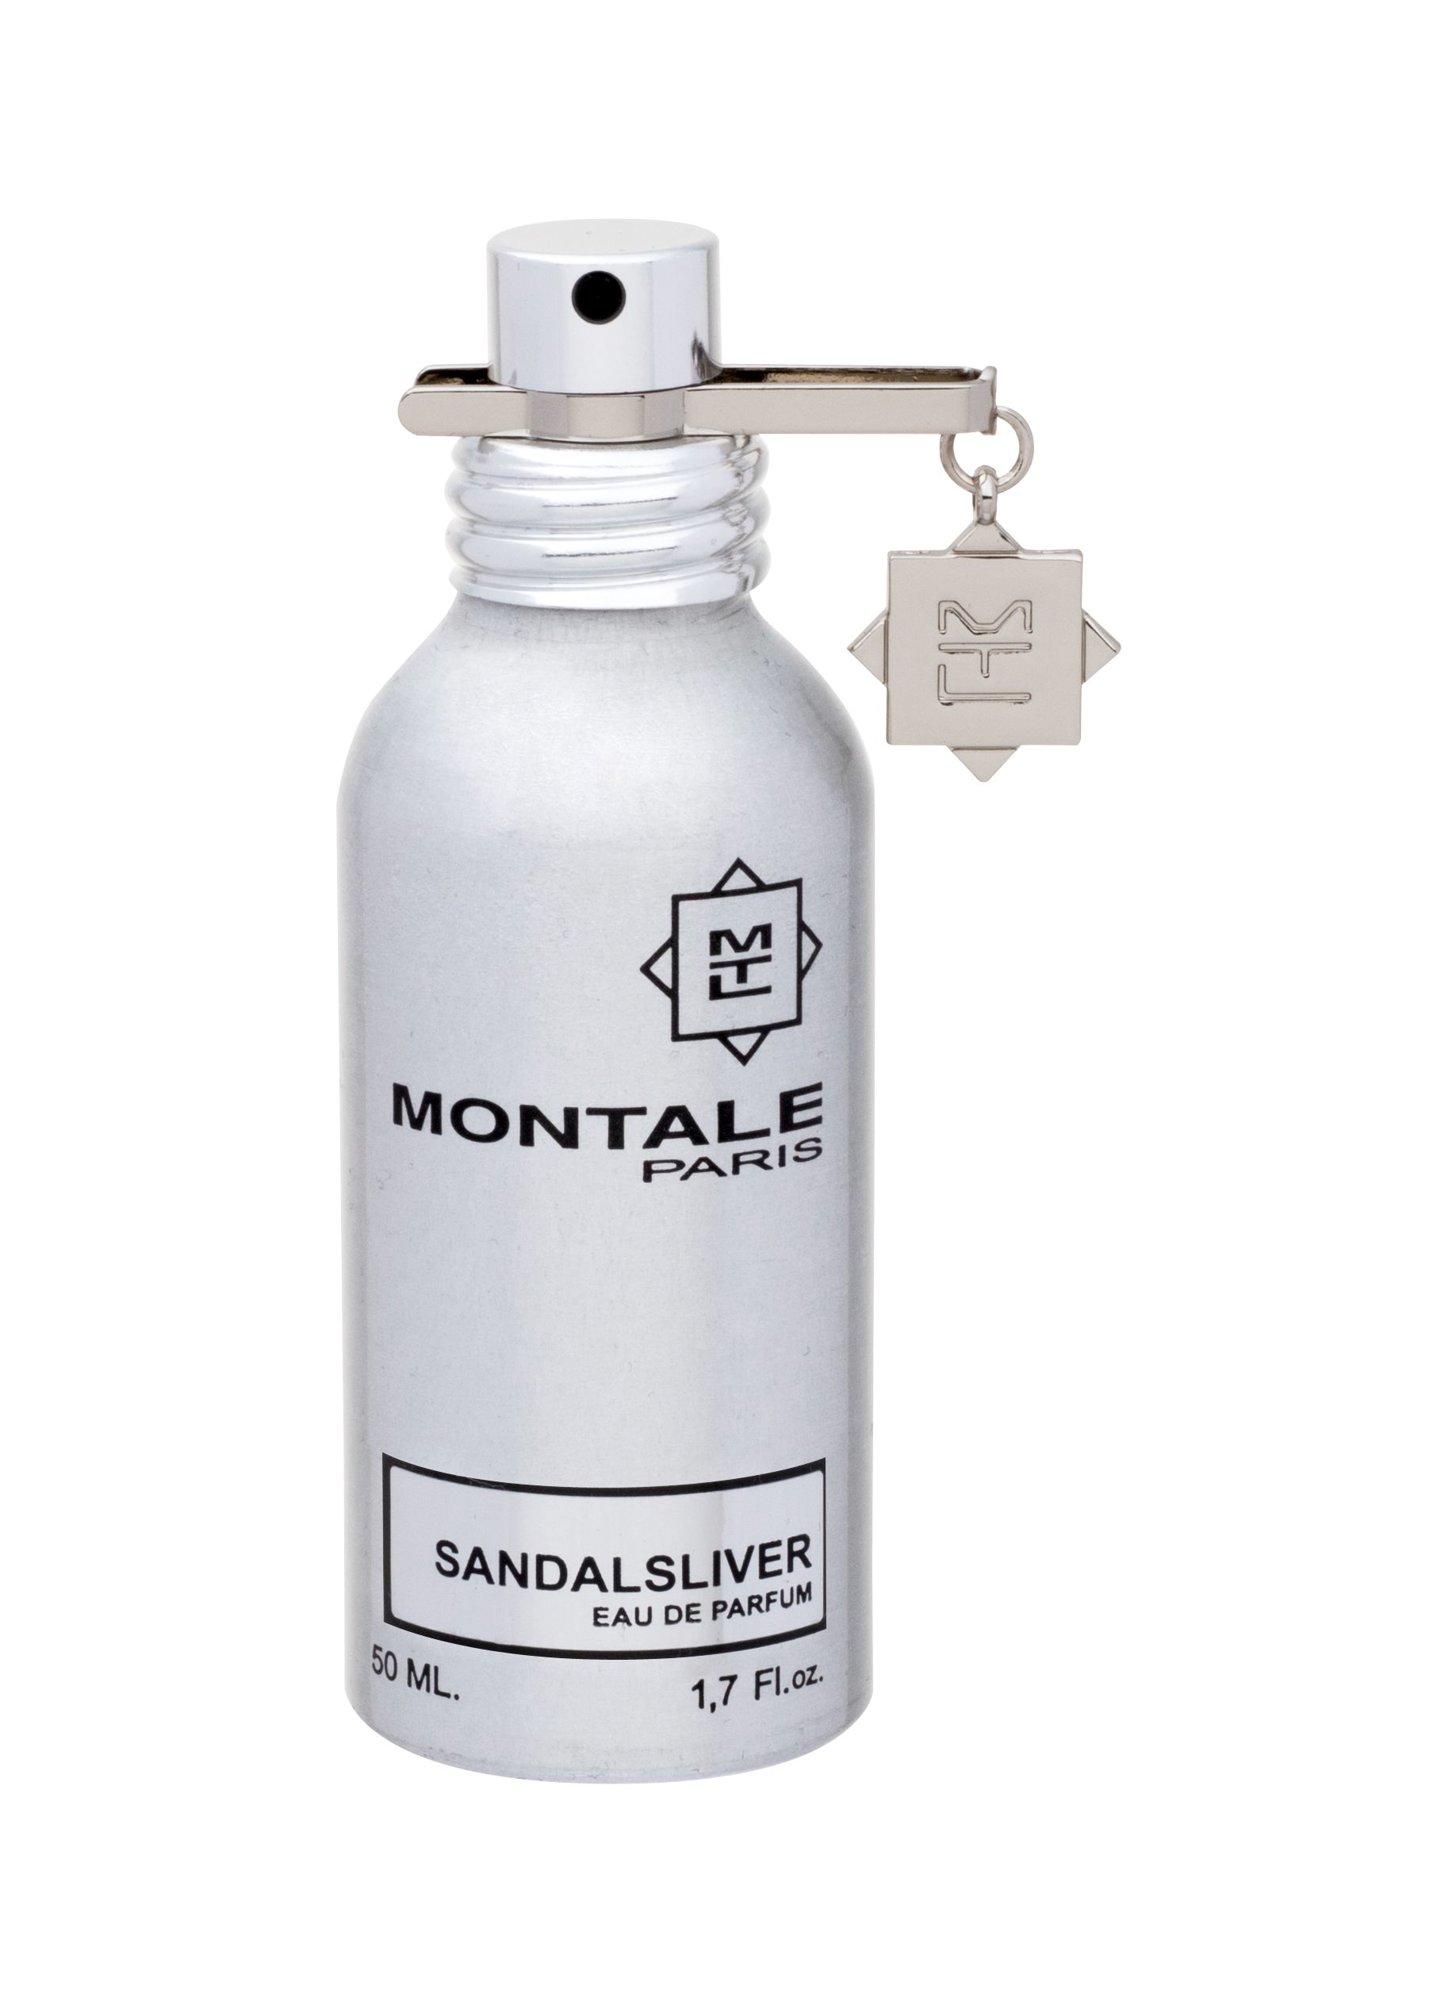 Montale Paris Sandal Sliver EDP 50ml